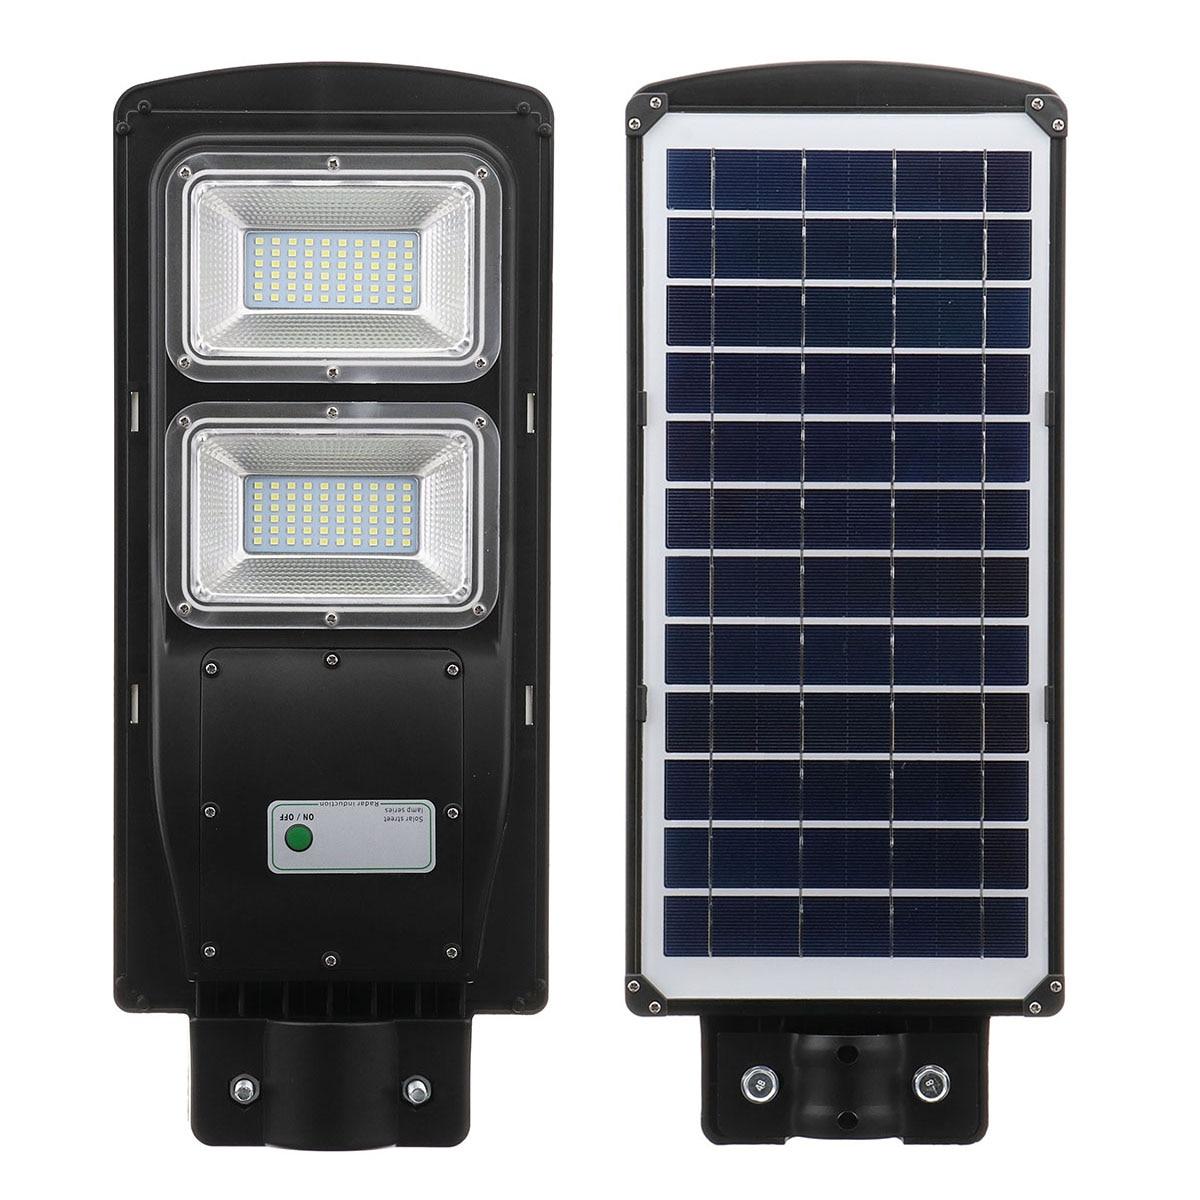 60W LED Solar Lamp IP67 2835smd Solar Powered Street Light for Hone Garden Wall Lamp Radar Sensor Outdoor Courtyard lighting